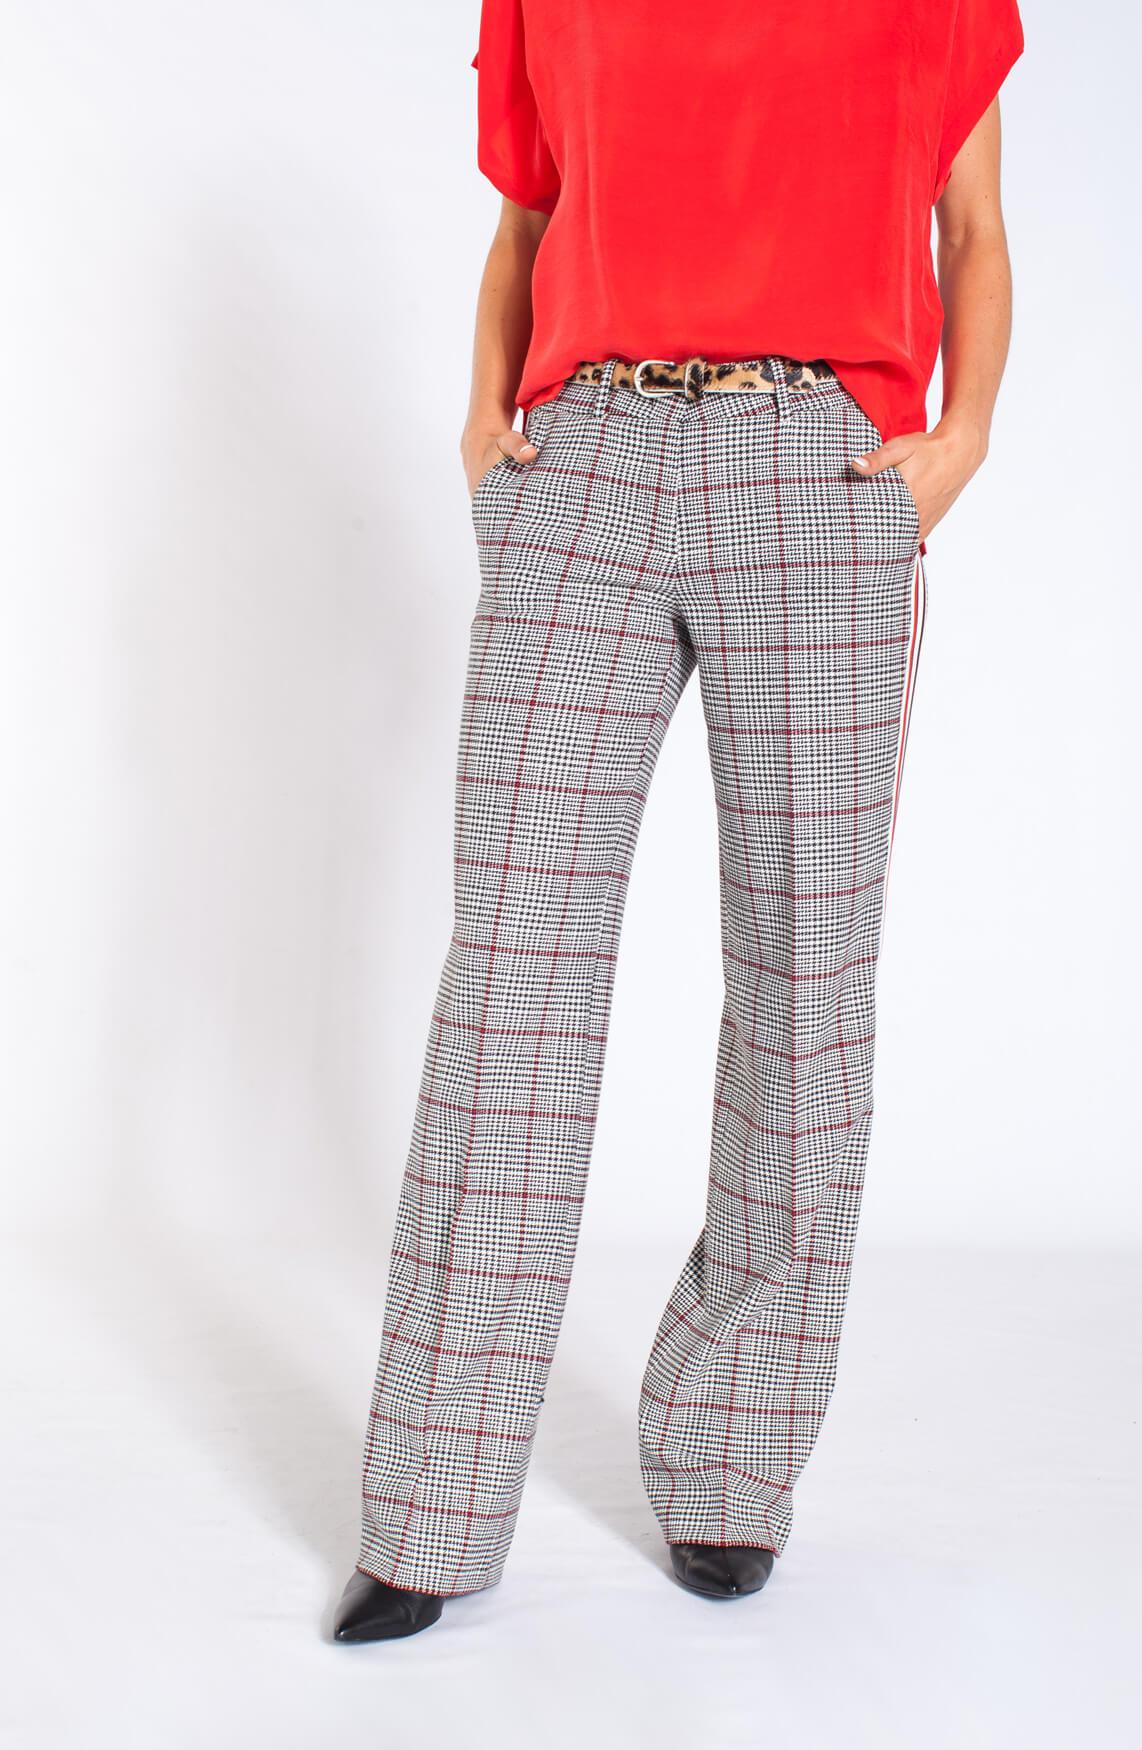 Cambio Dames Malice geruite pantalon Rood